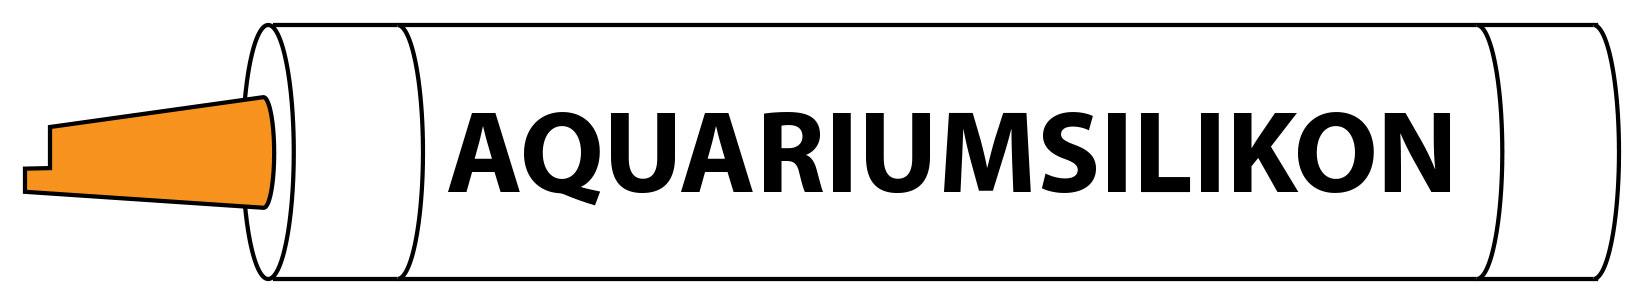 Trick Aquariumsilikon